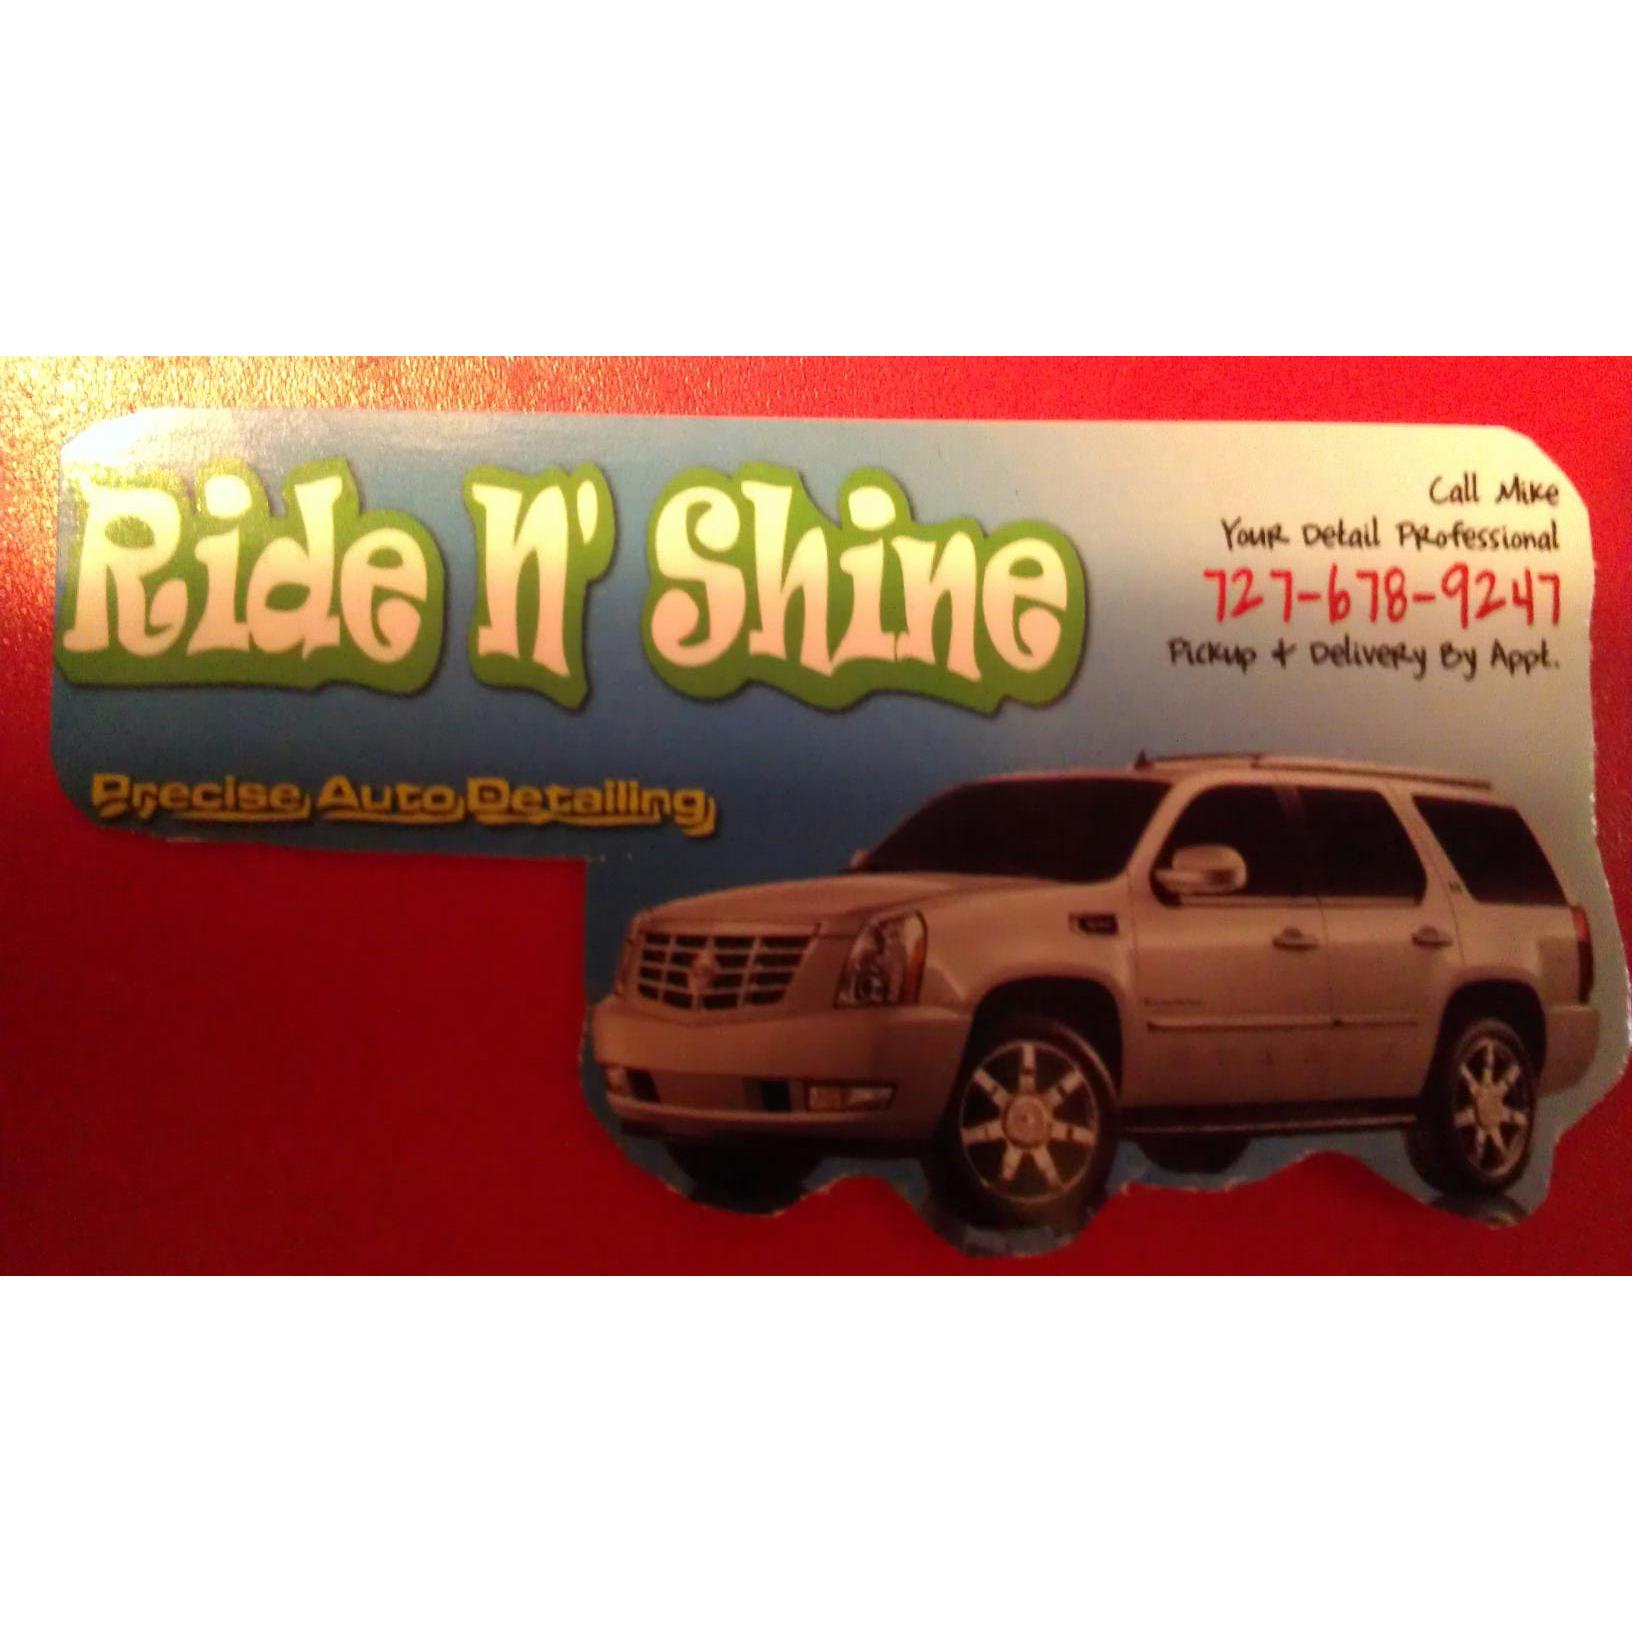 Ride N Shine Mobile Auto Detailing - Pinellas Park, FL 33781 - (727)678-9247 | ShowMeLocal.com